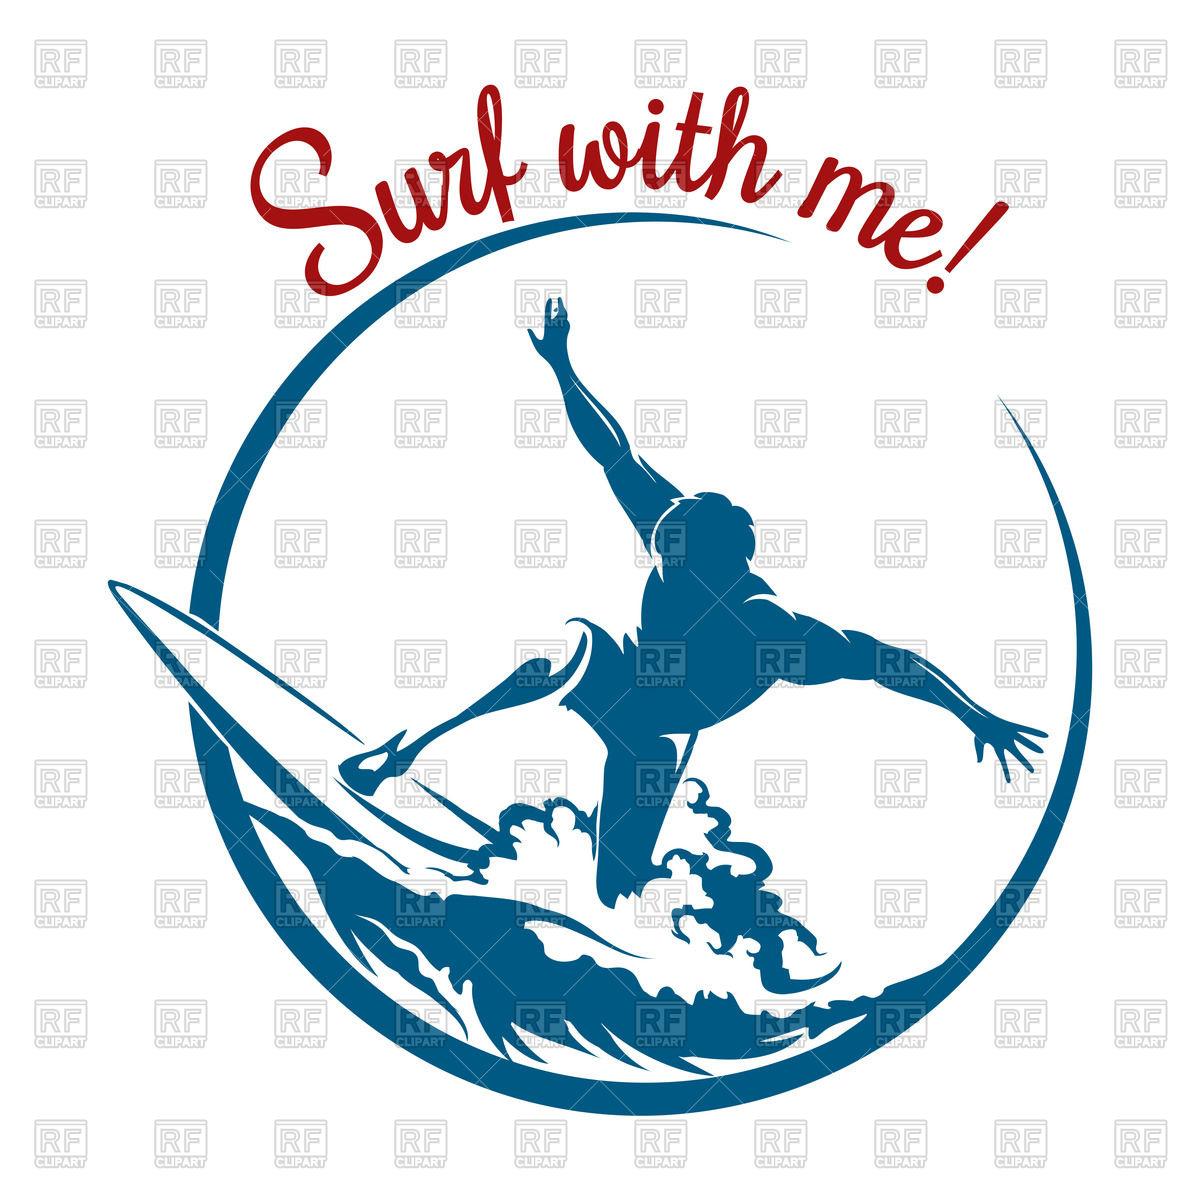 surfer silhouette clip art at getdrawings com free for personal rh getdrawings com